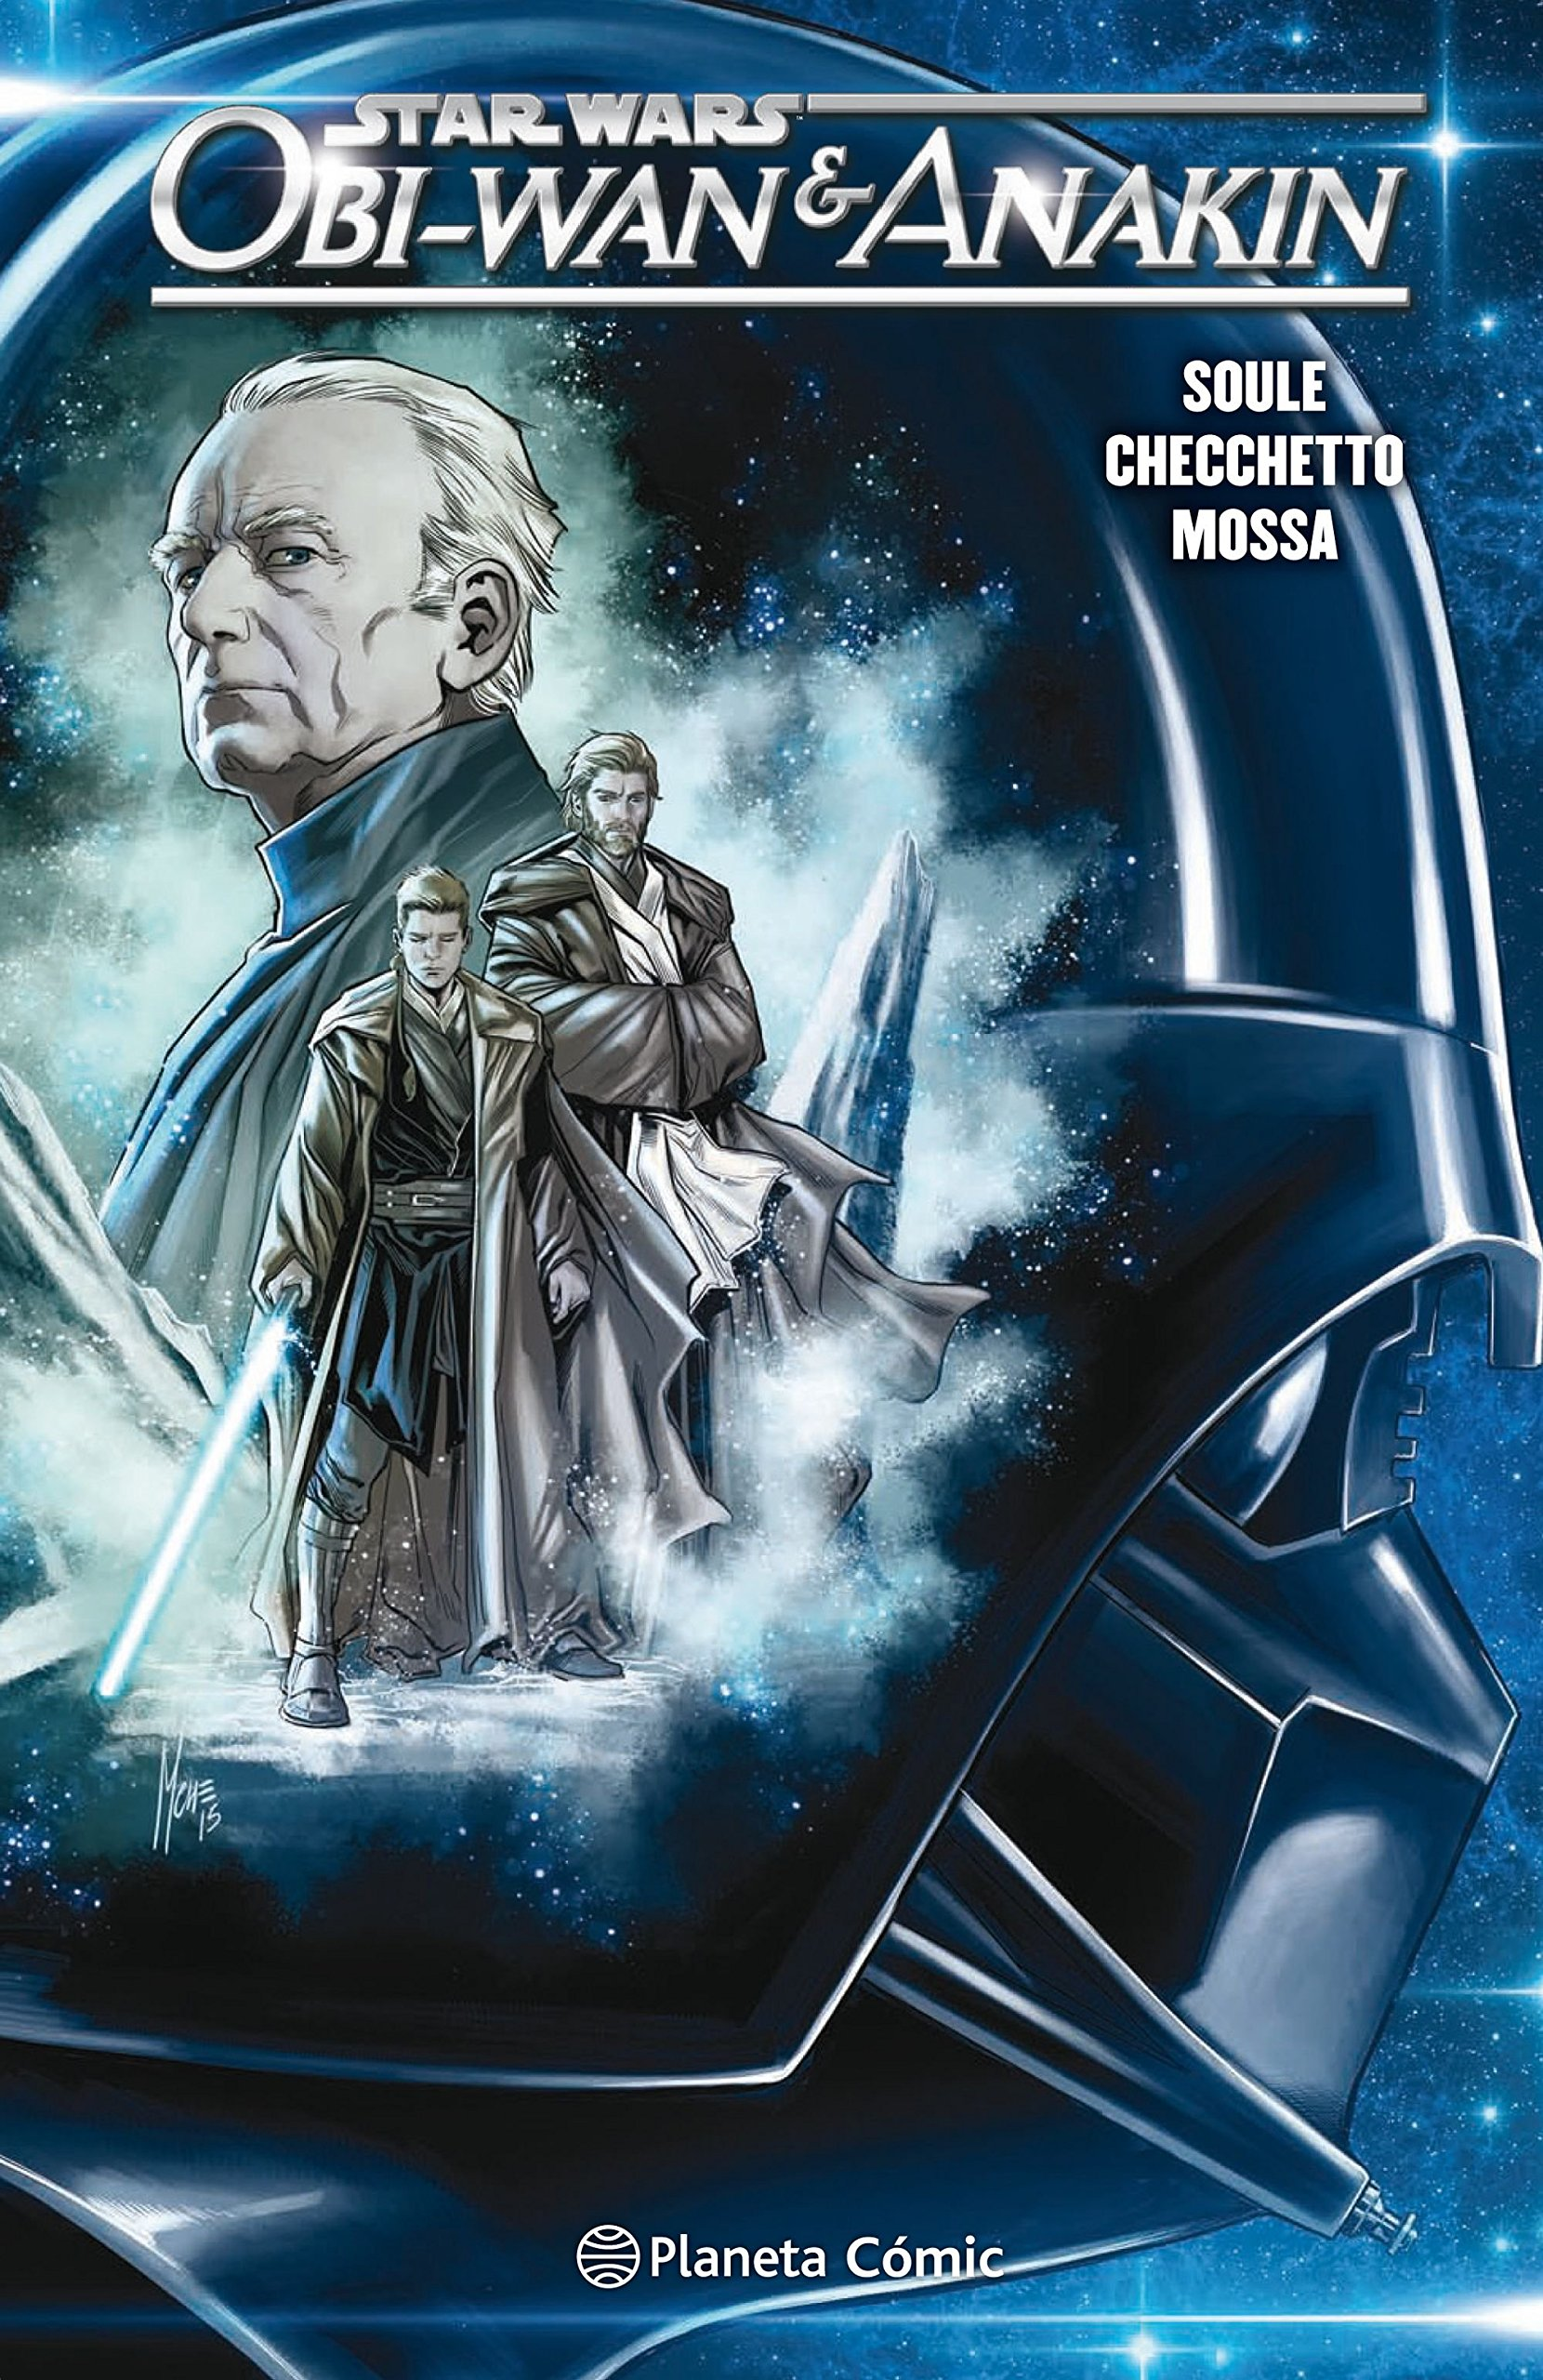 Star Wars Obi-Wan and Anakin (tomo recopilatorio) (Star Wars: Recopilatorios Marvel) Tapa dura – 30 oct 2018 Charles Soule Planeta DeAgostini Cómics 8491731393 Science fiction